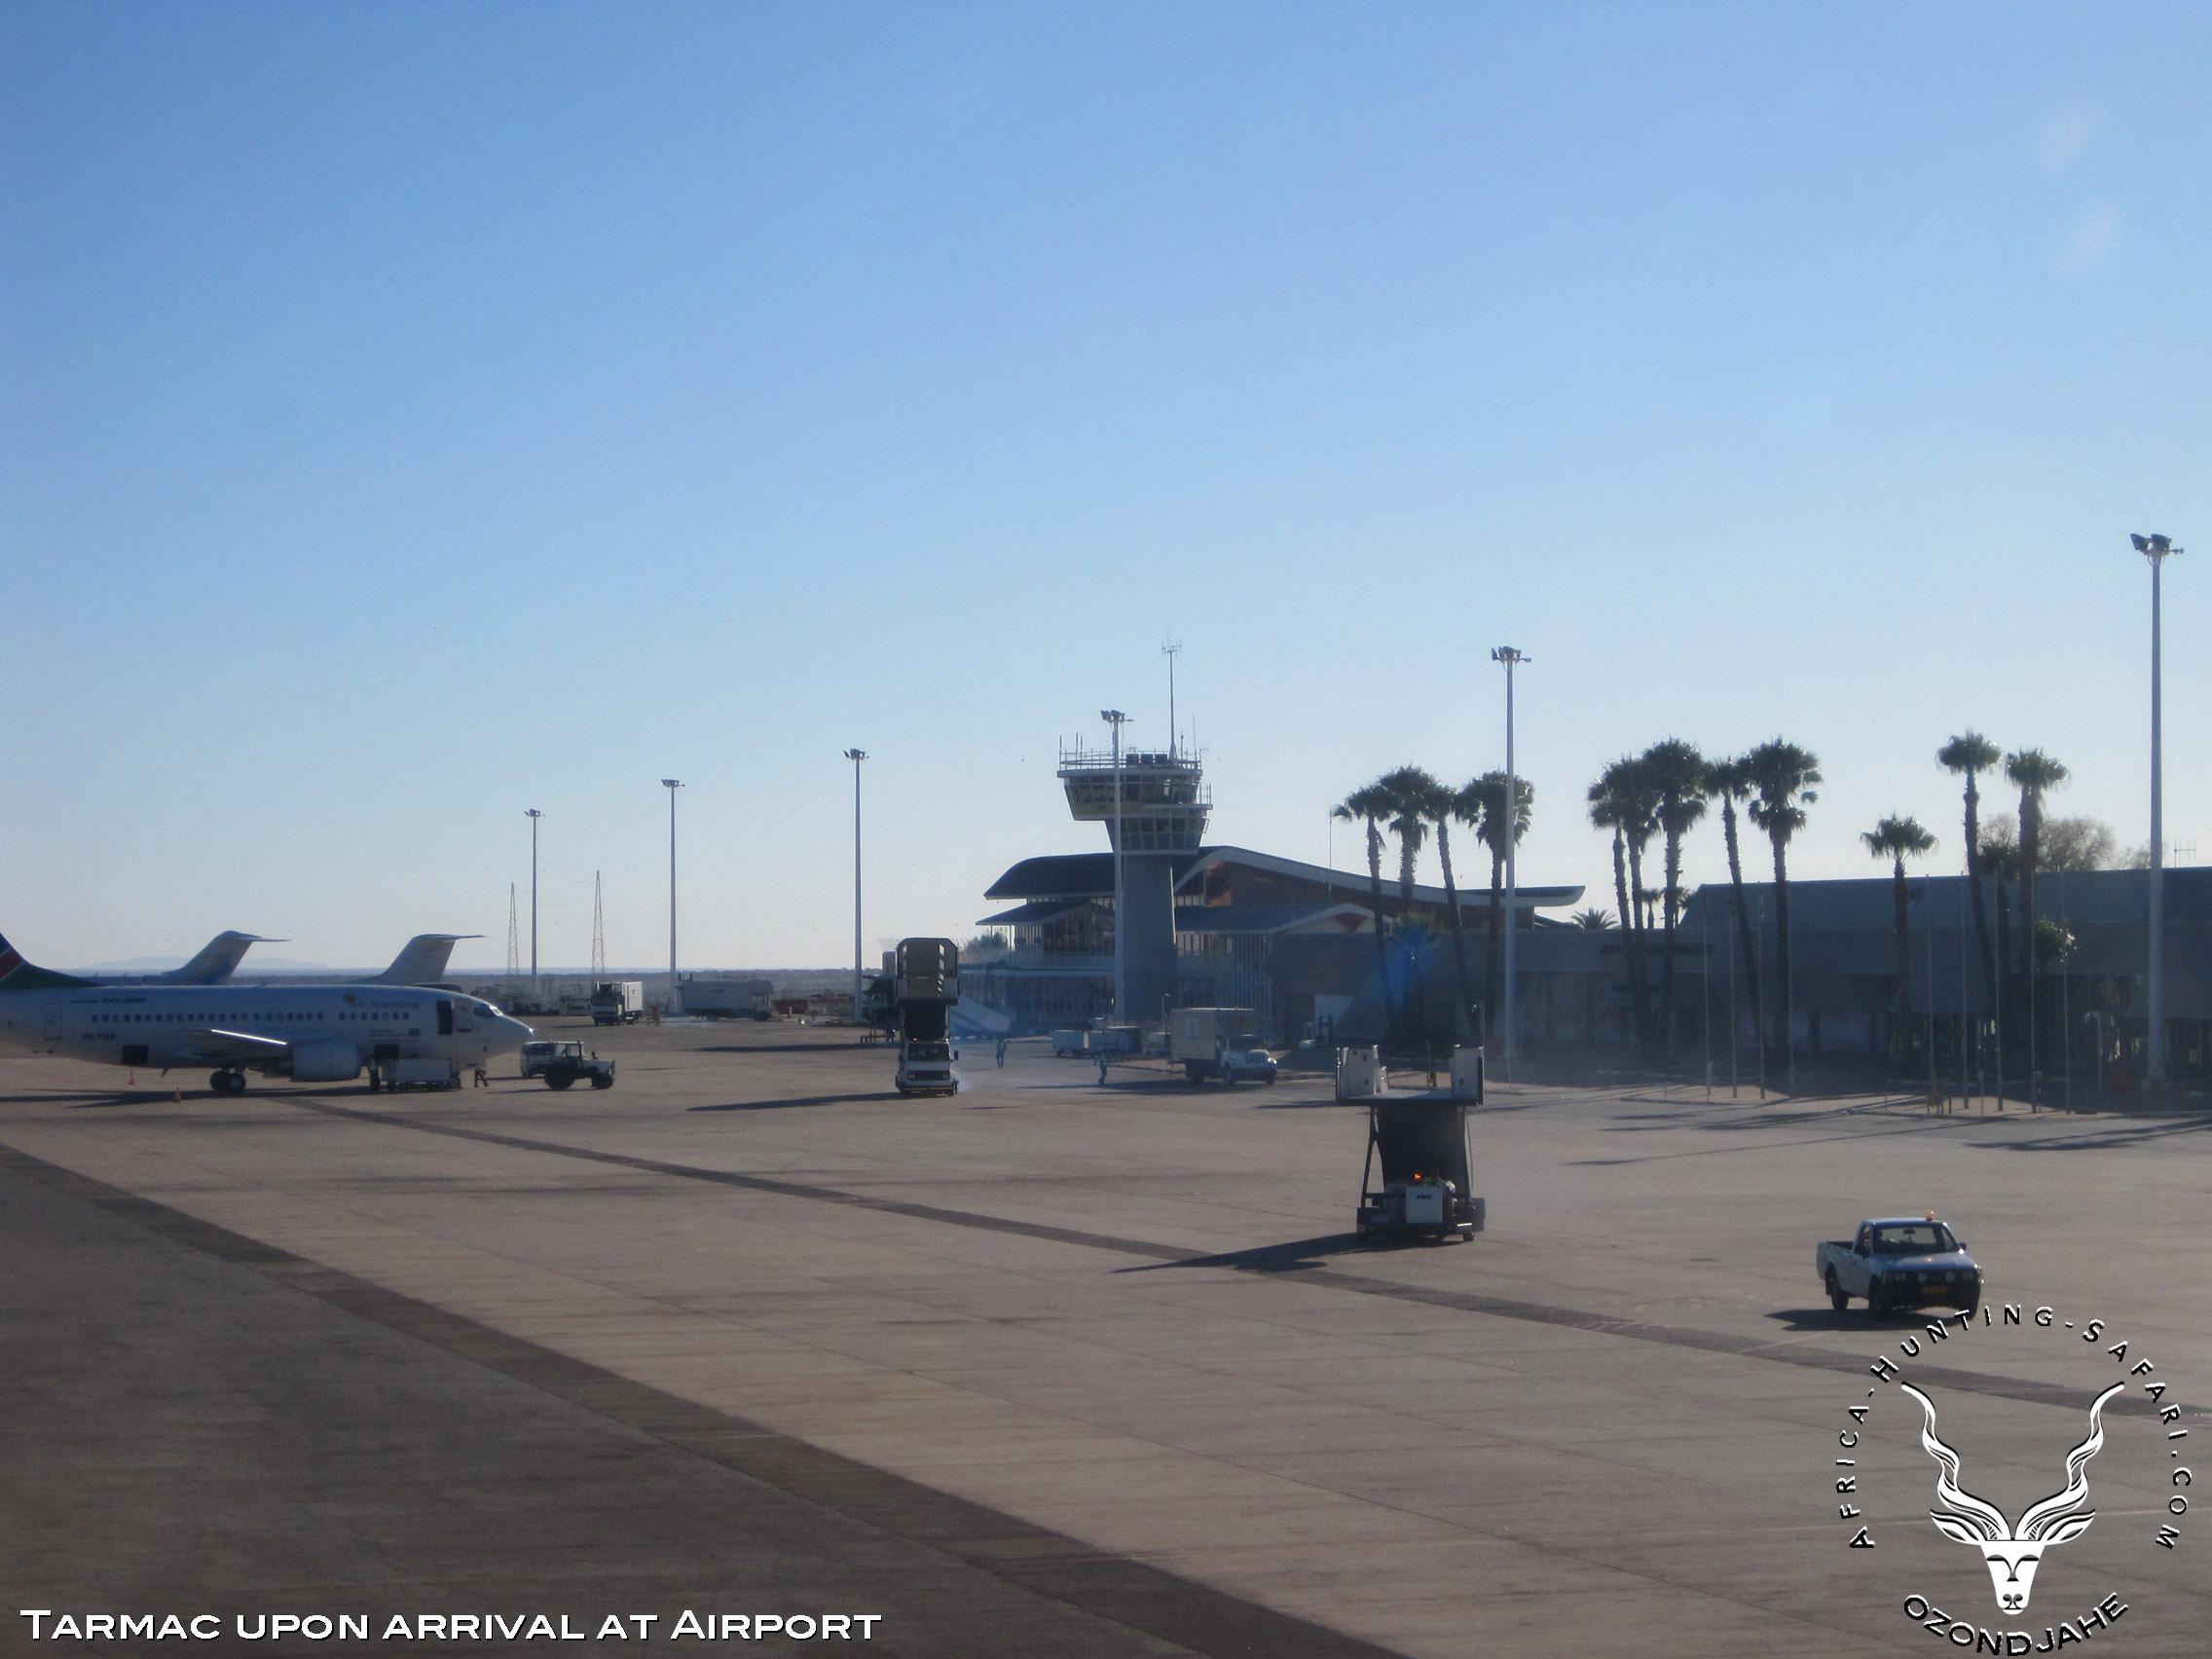 Hunting-africa-aeroport-tarmac